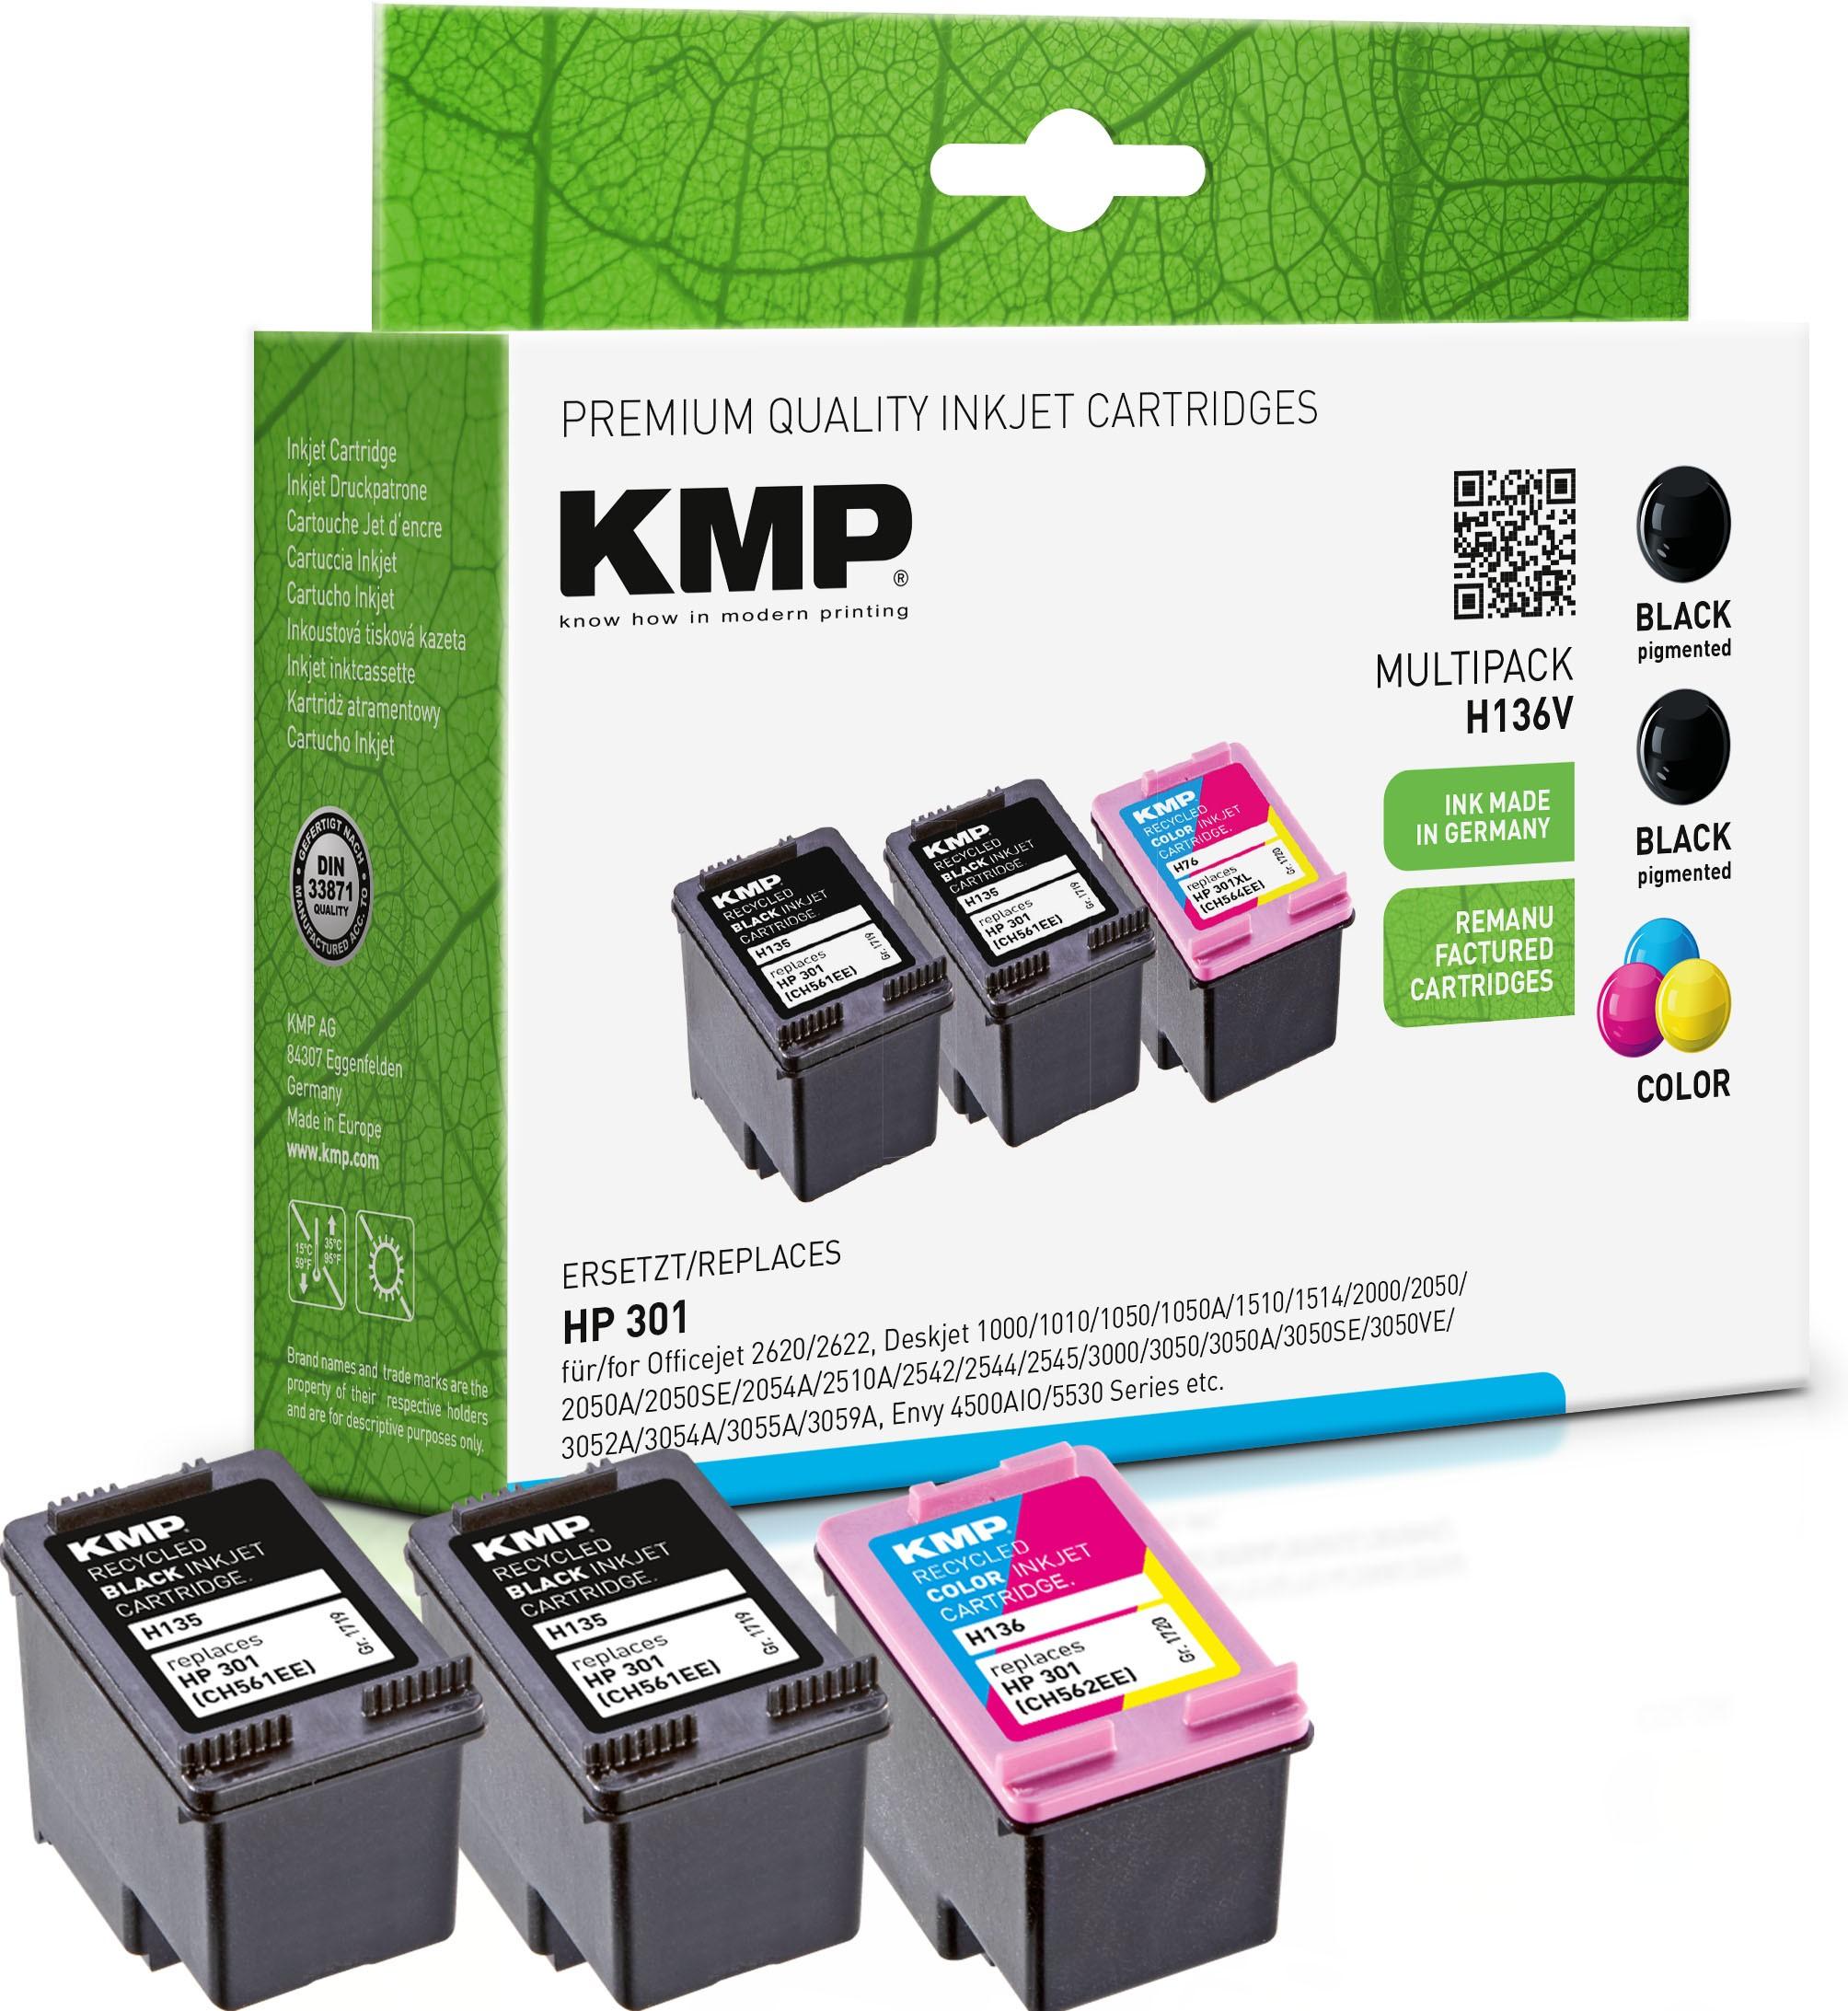 KMP Multipack H136V schwarz, farbig Tintenpatronen ersetzen HP Officejet/Deskjet HP301 (E5Y87EE)